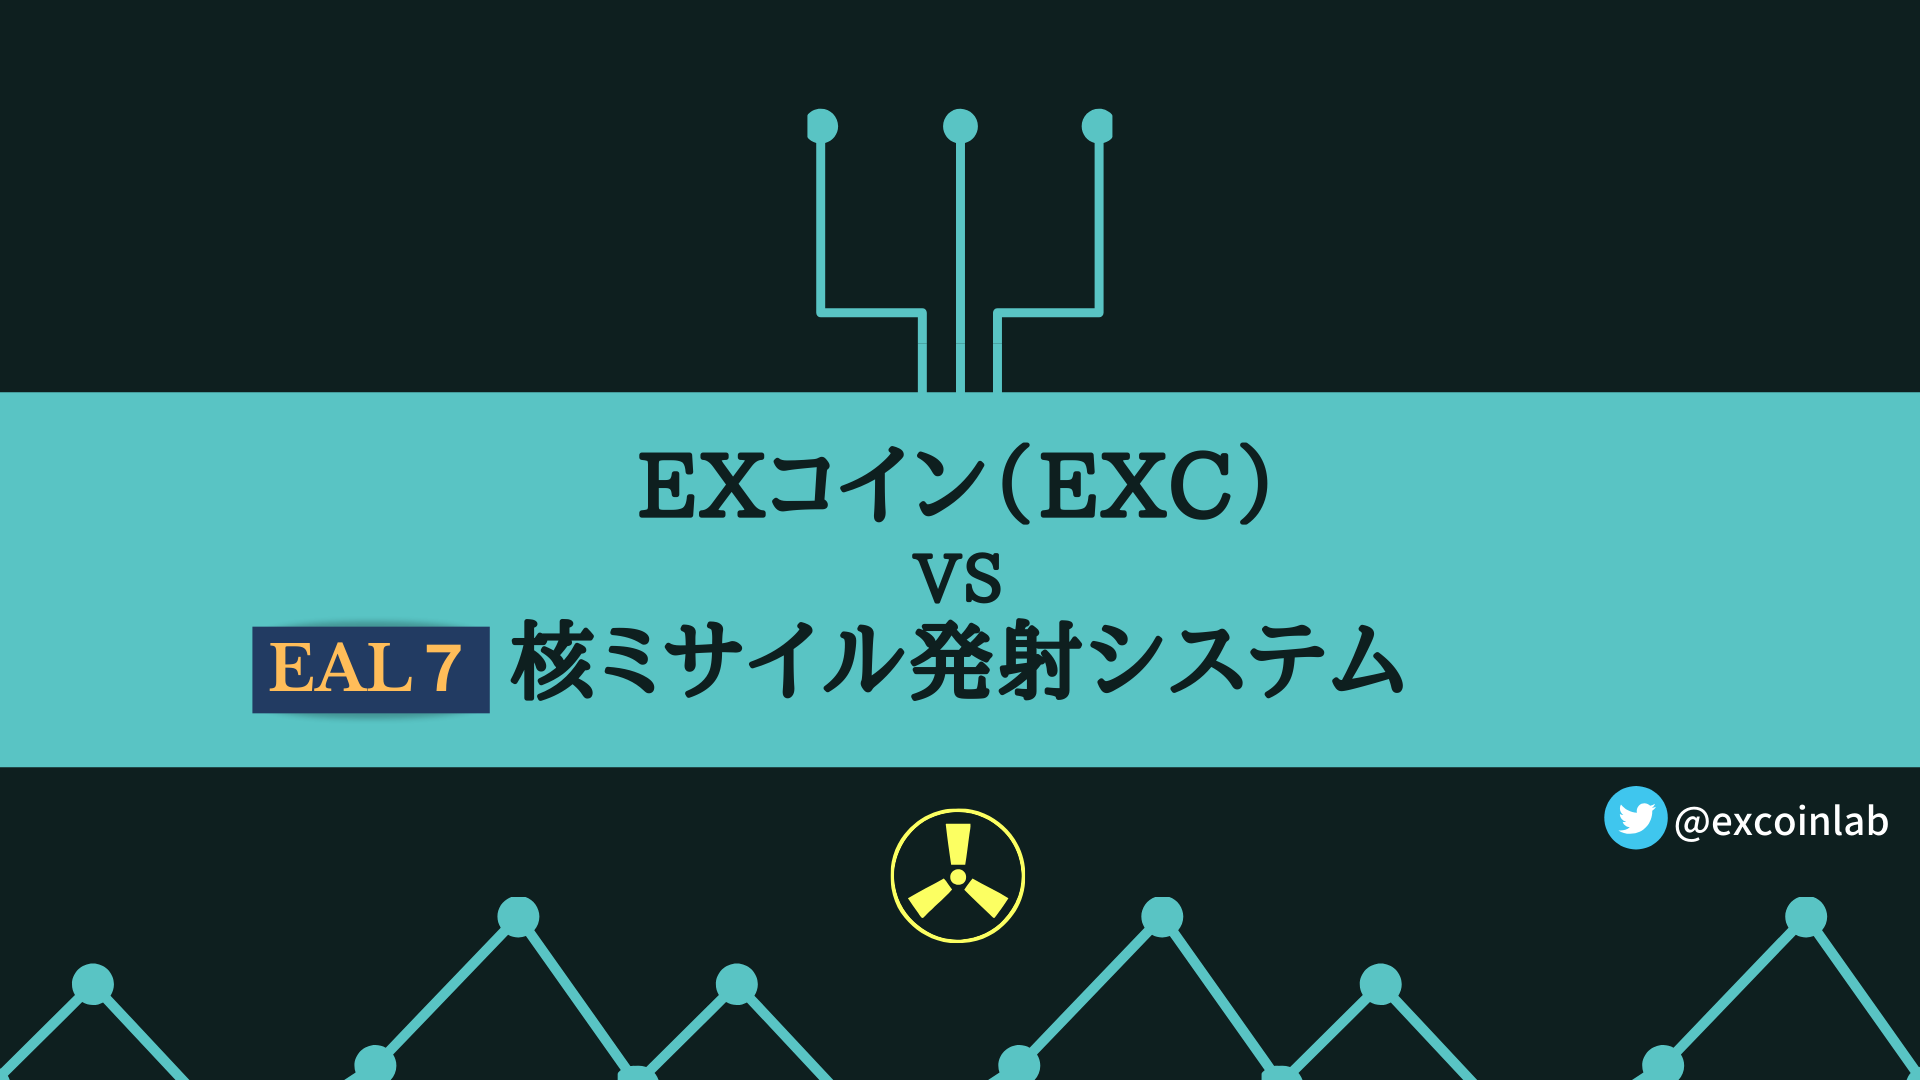 EXコイン(EXC) vs 核ミサイル発射システム